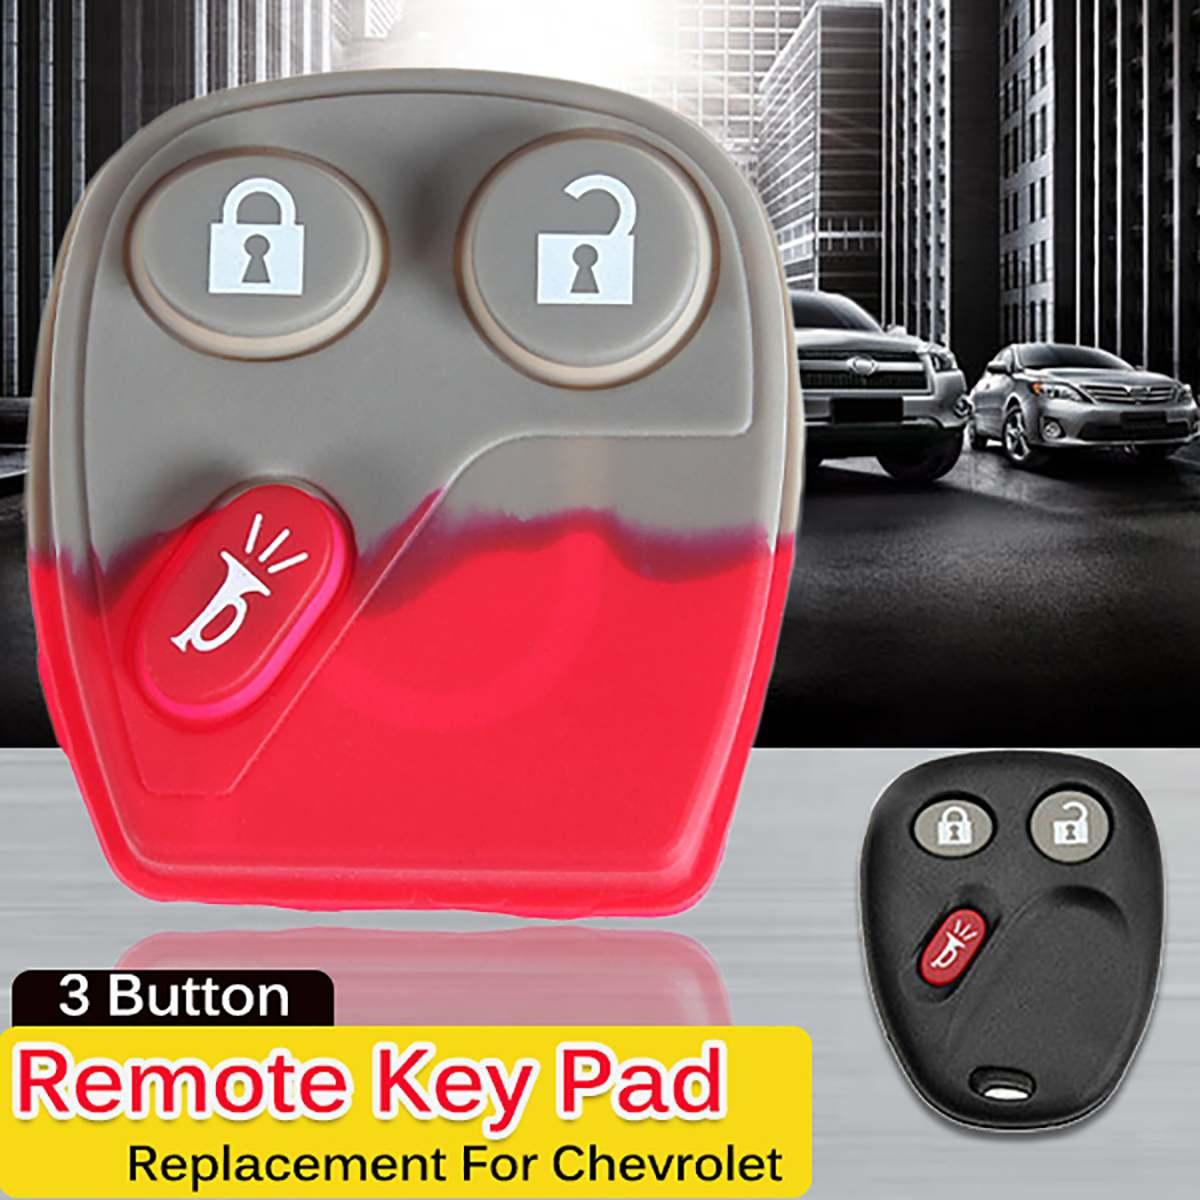 Keyless Entry Remote Control Car Key Fob for 2003-2006 Chevrolet Avalanche